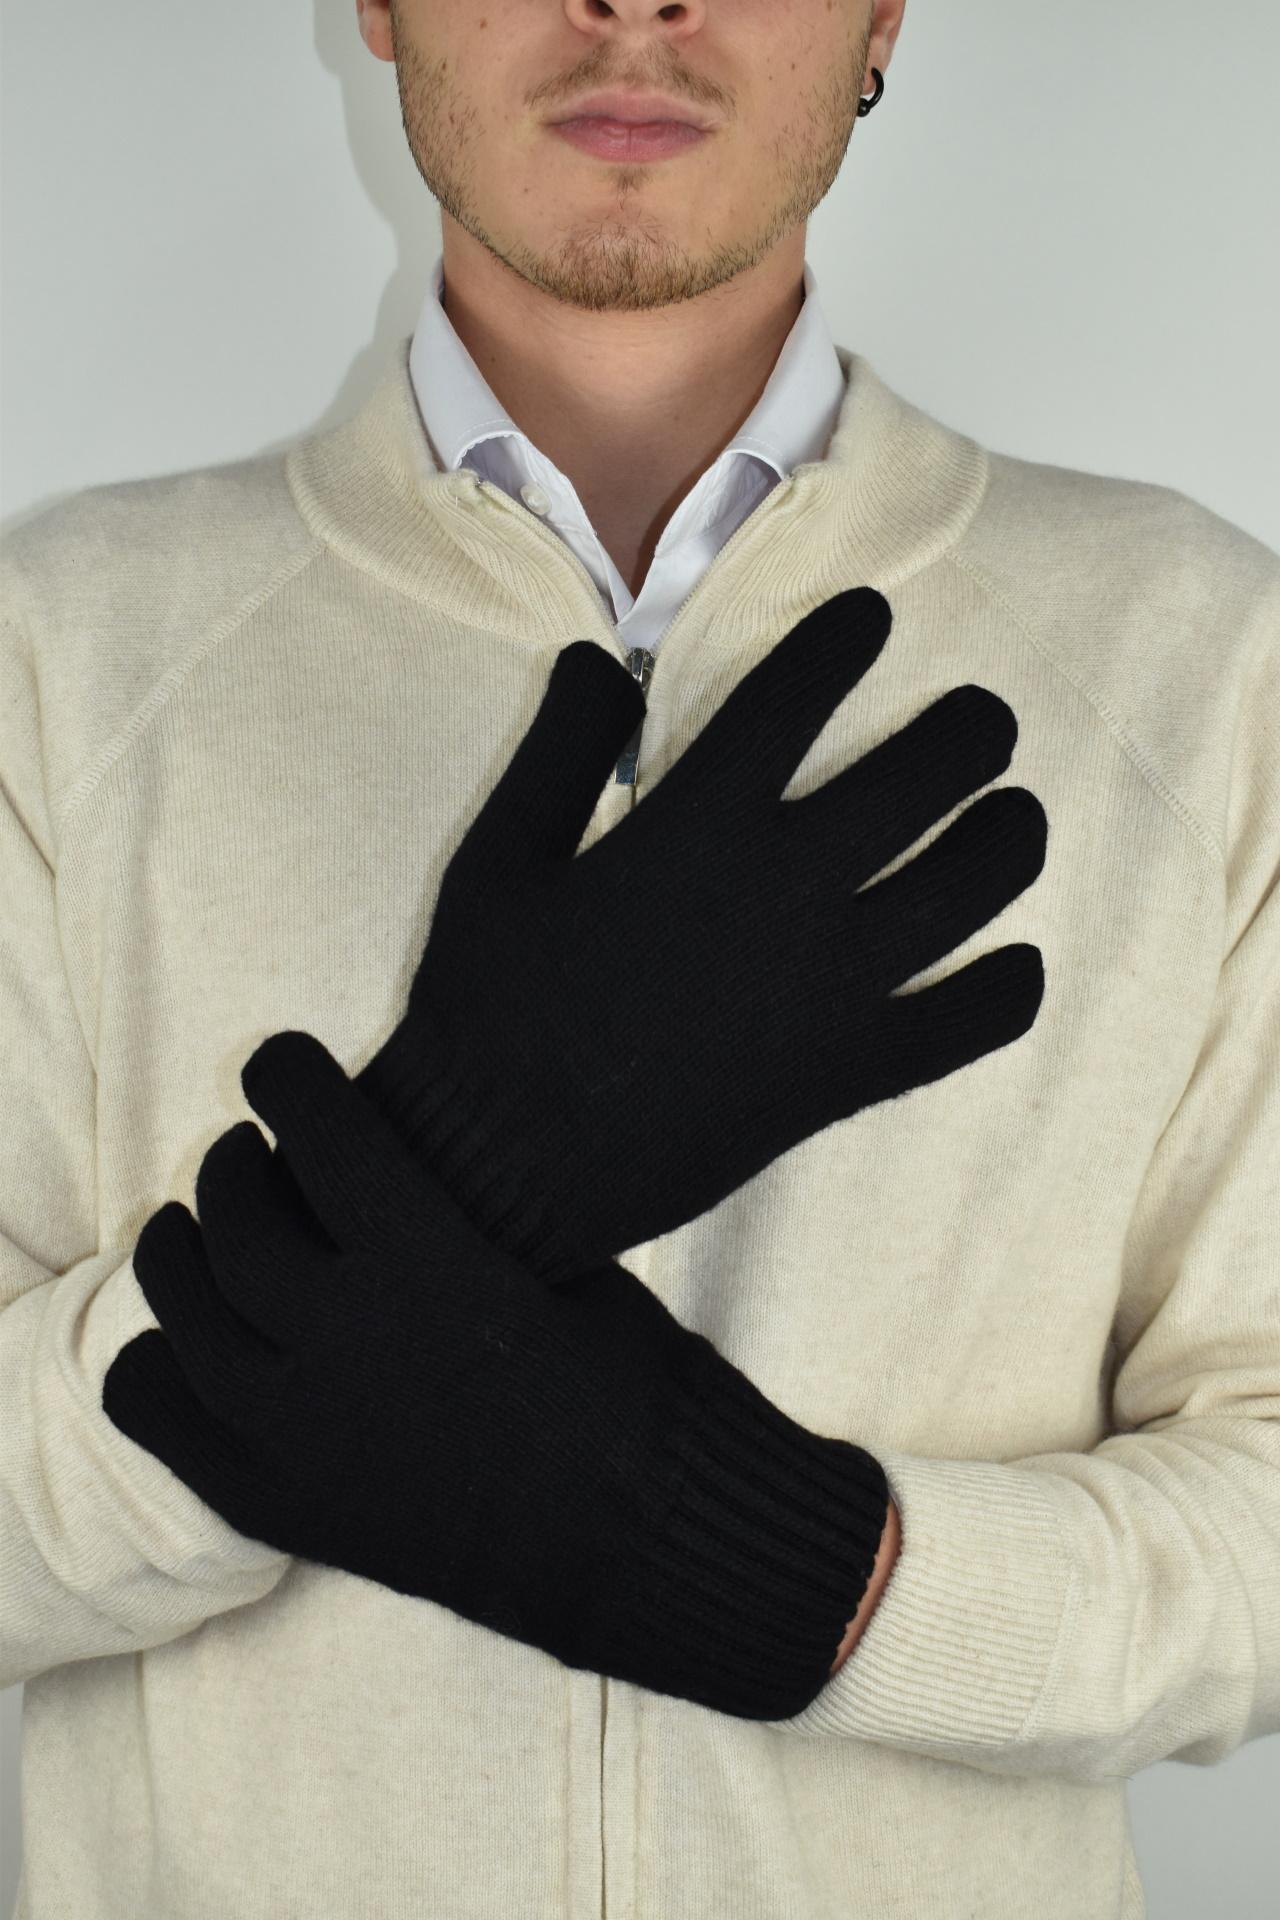 GLOVESMIXDARIO NERO GUANTI UOMO IN CASHMERE E LANA 1 1stAmerican guanti in lana e cashmere da uomo Made in Italy - caldi guanti invernali